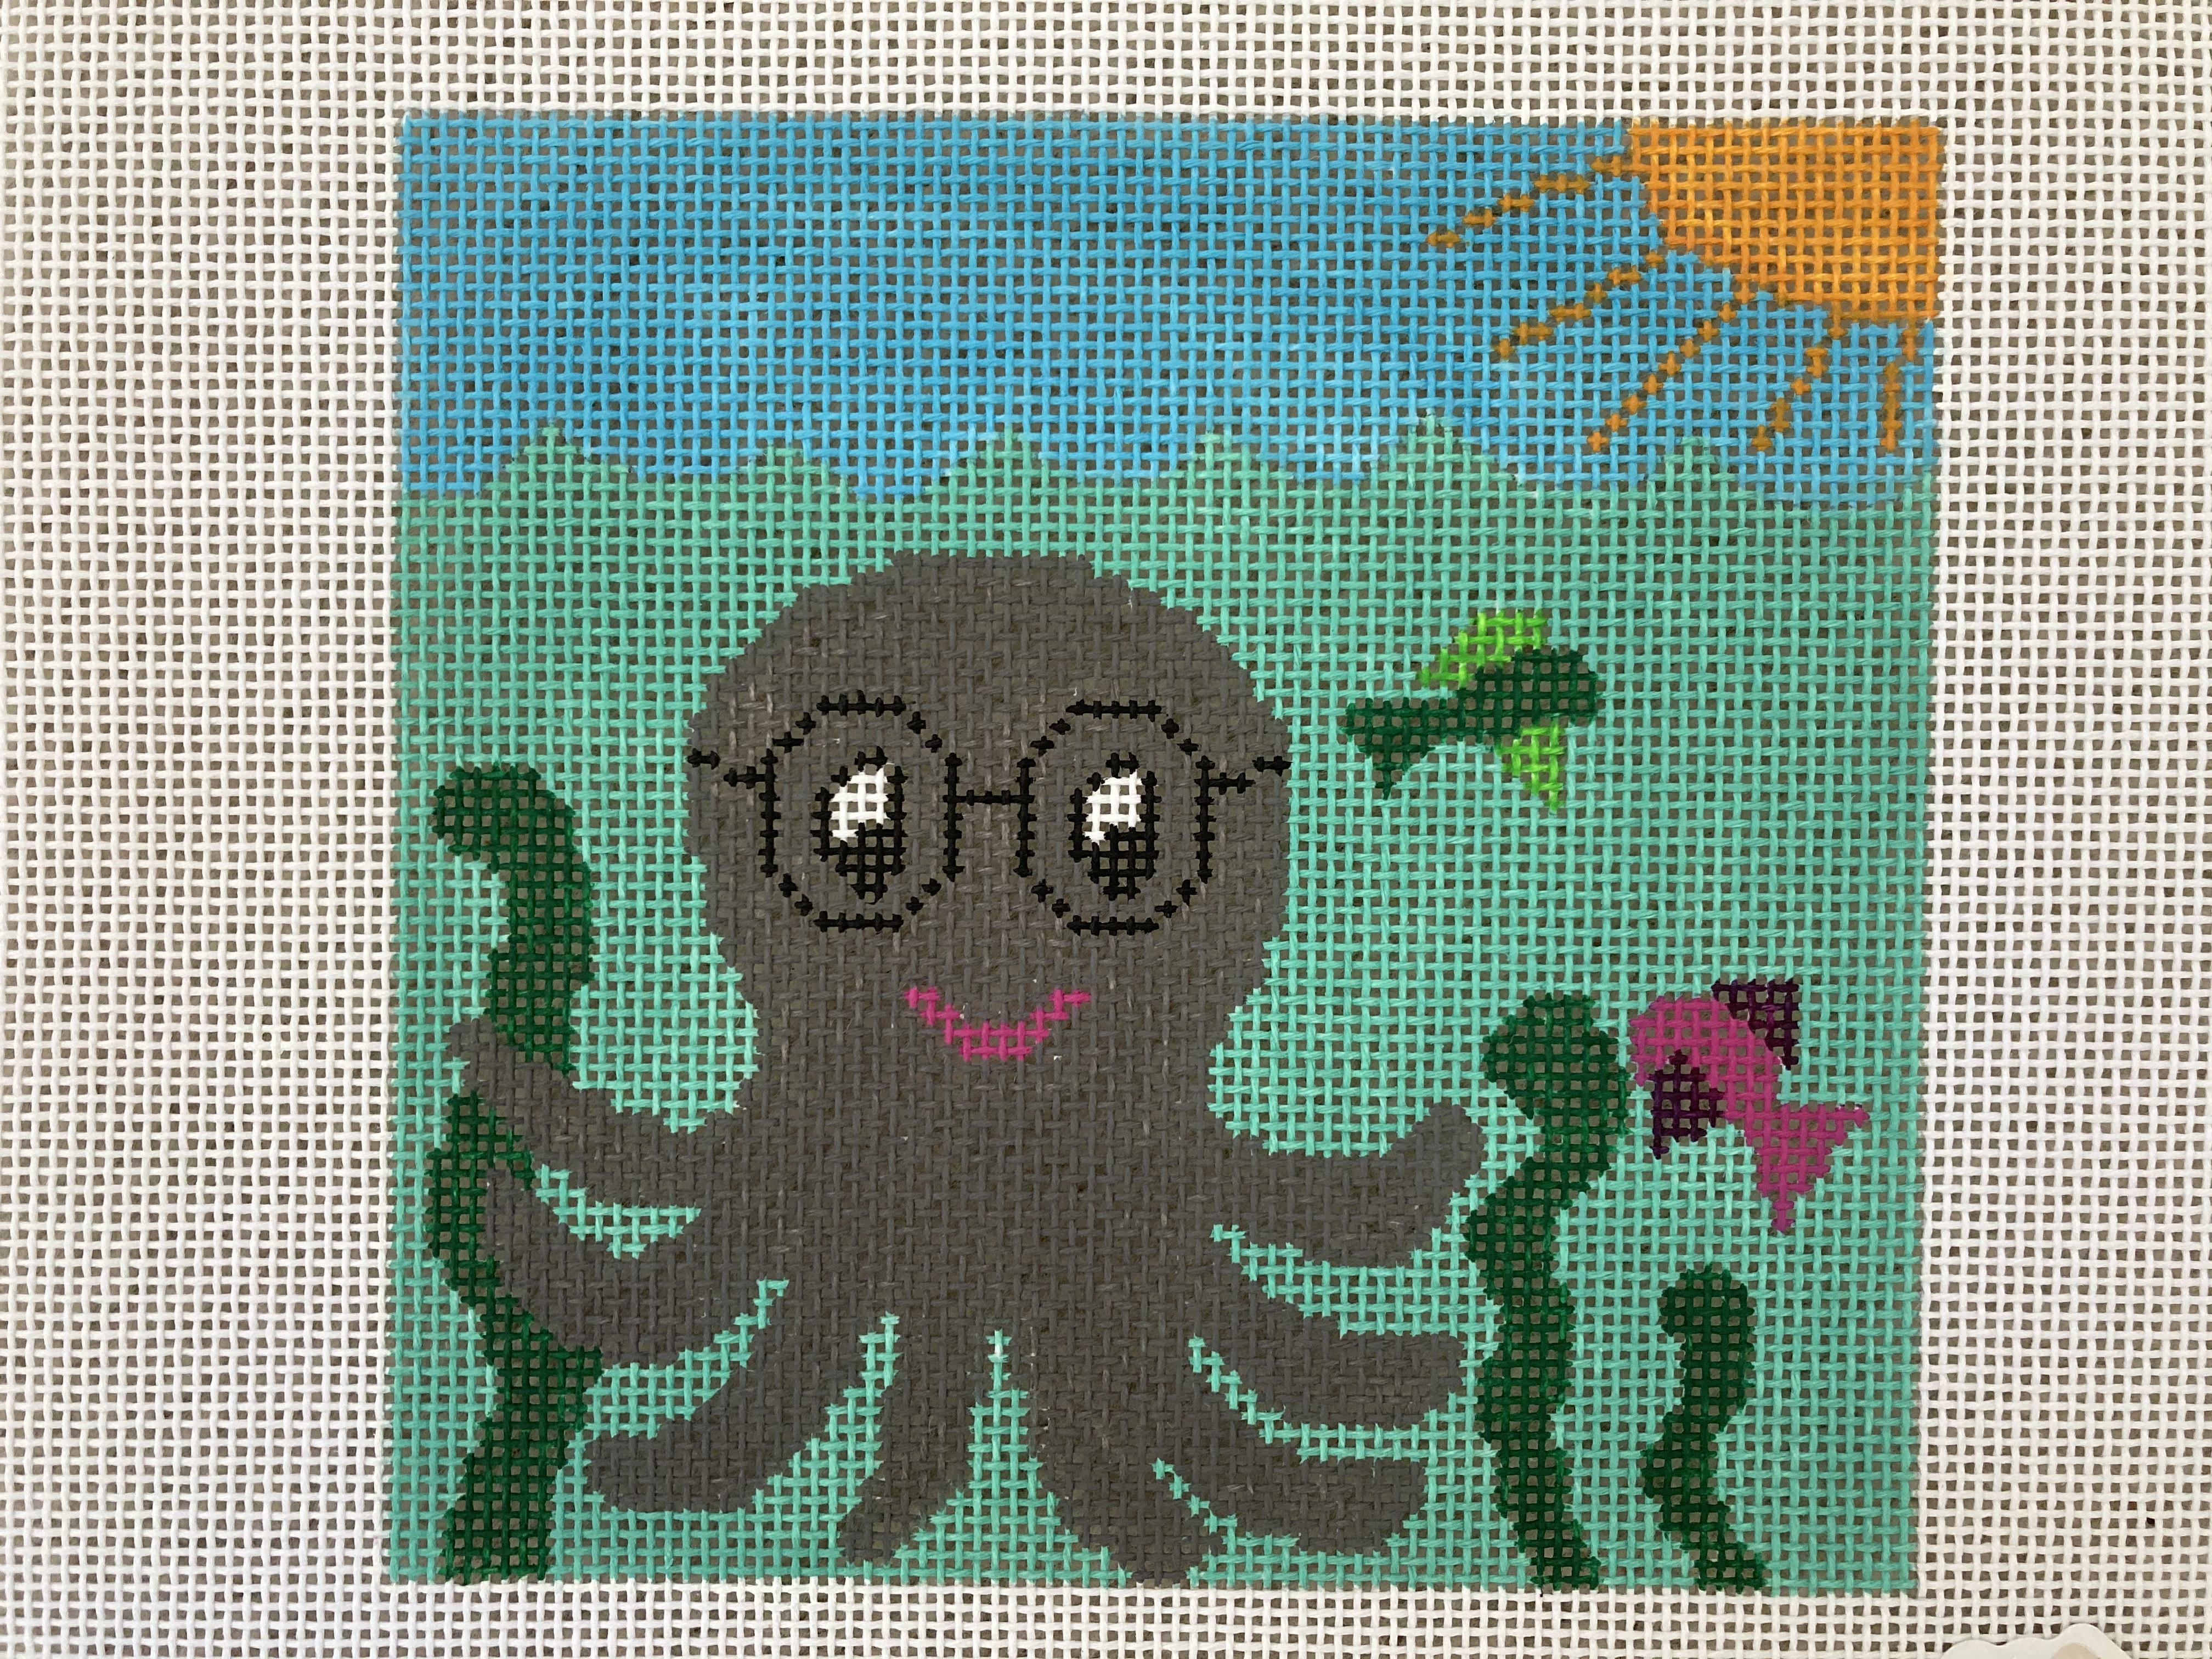 Cathleen's Octopus